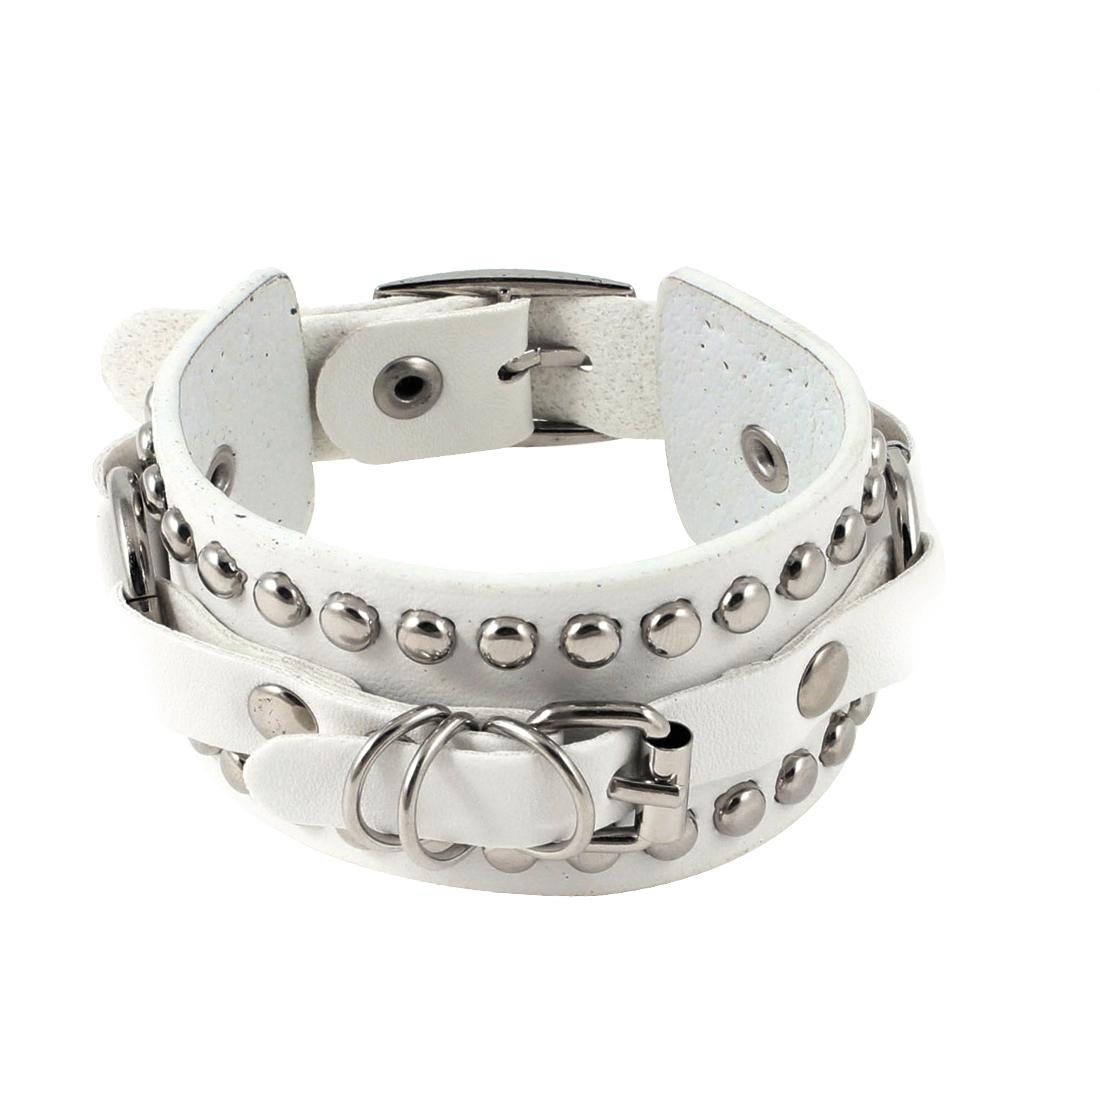 Women Single Pin Buckle Faux Leather Adjustable Bangle Bracelet White